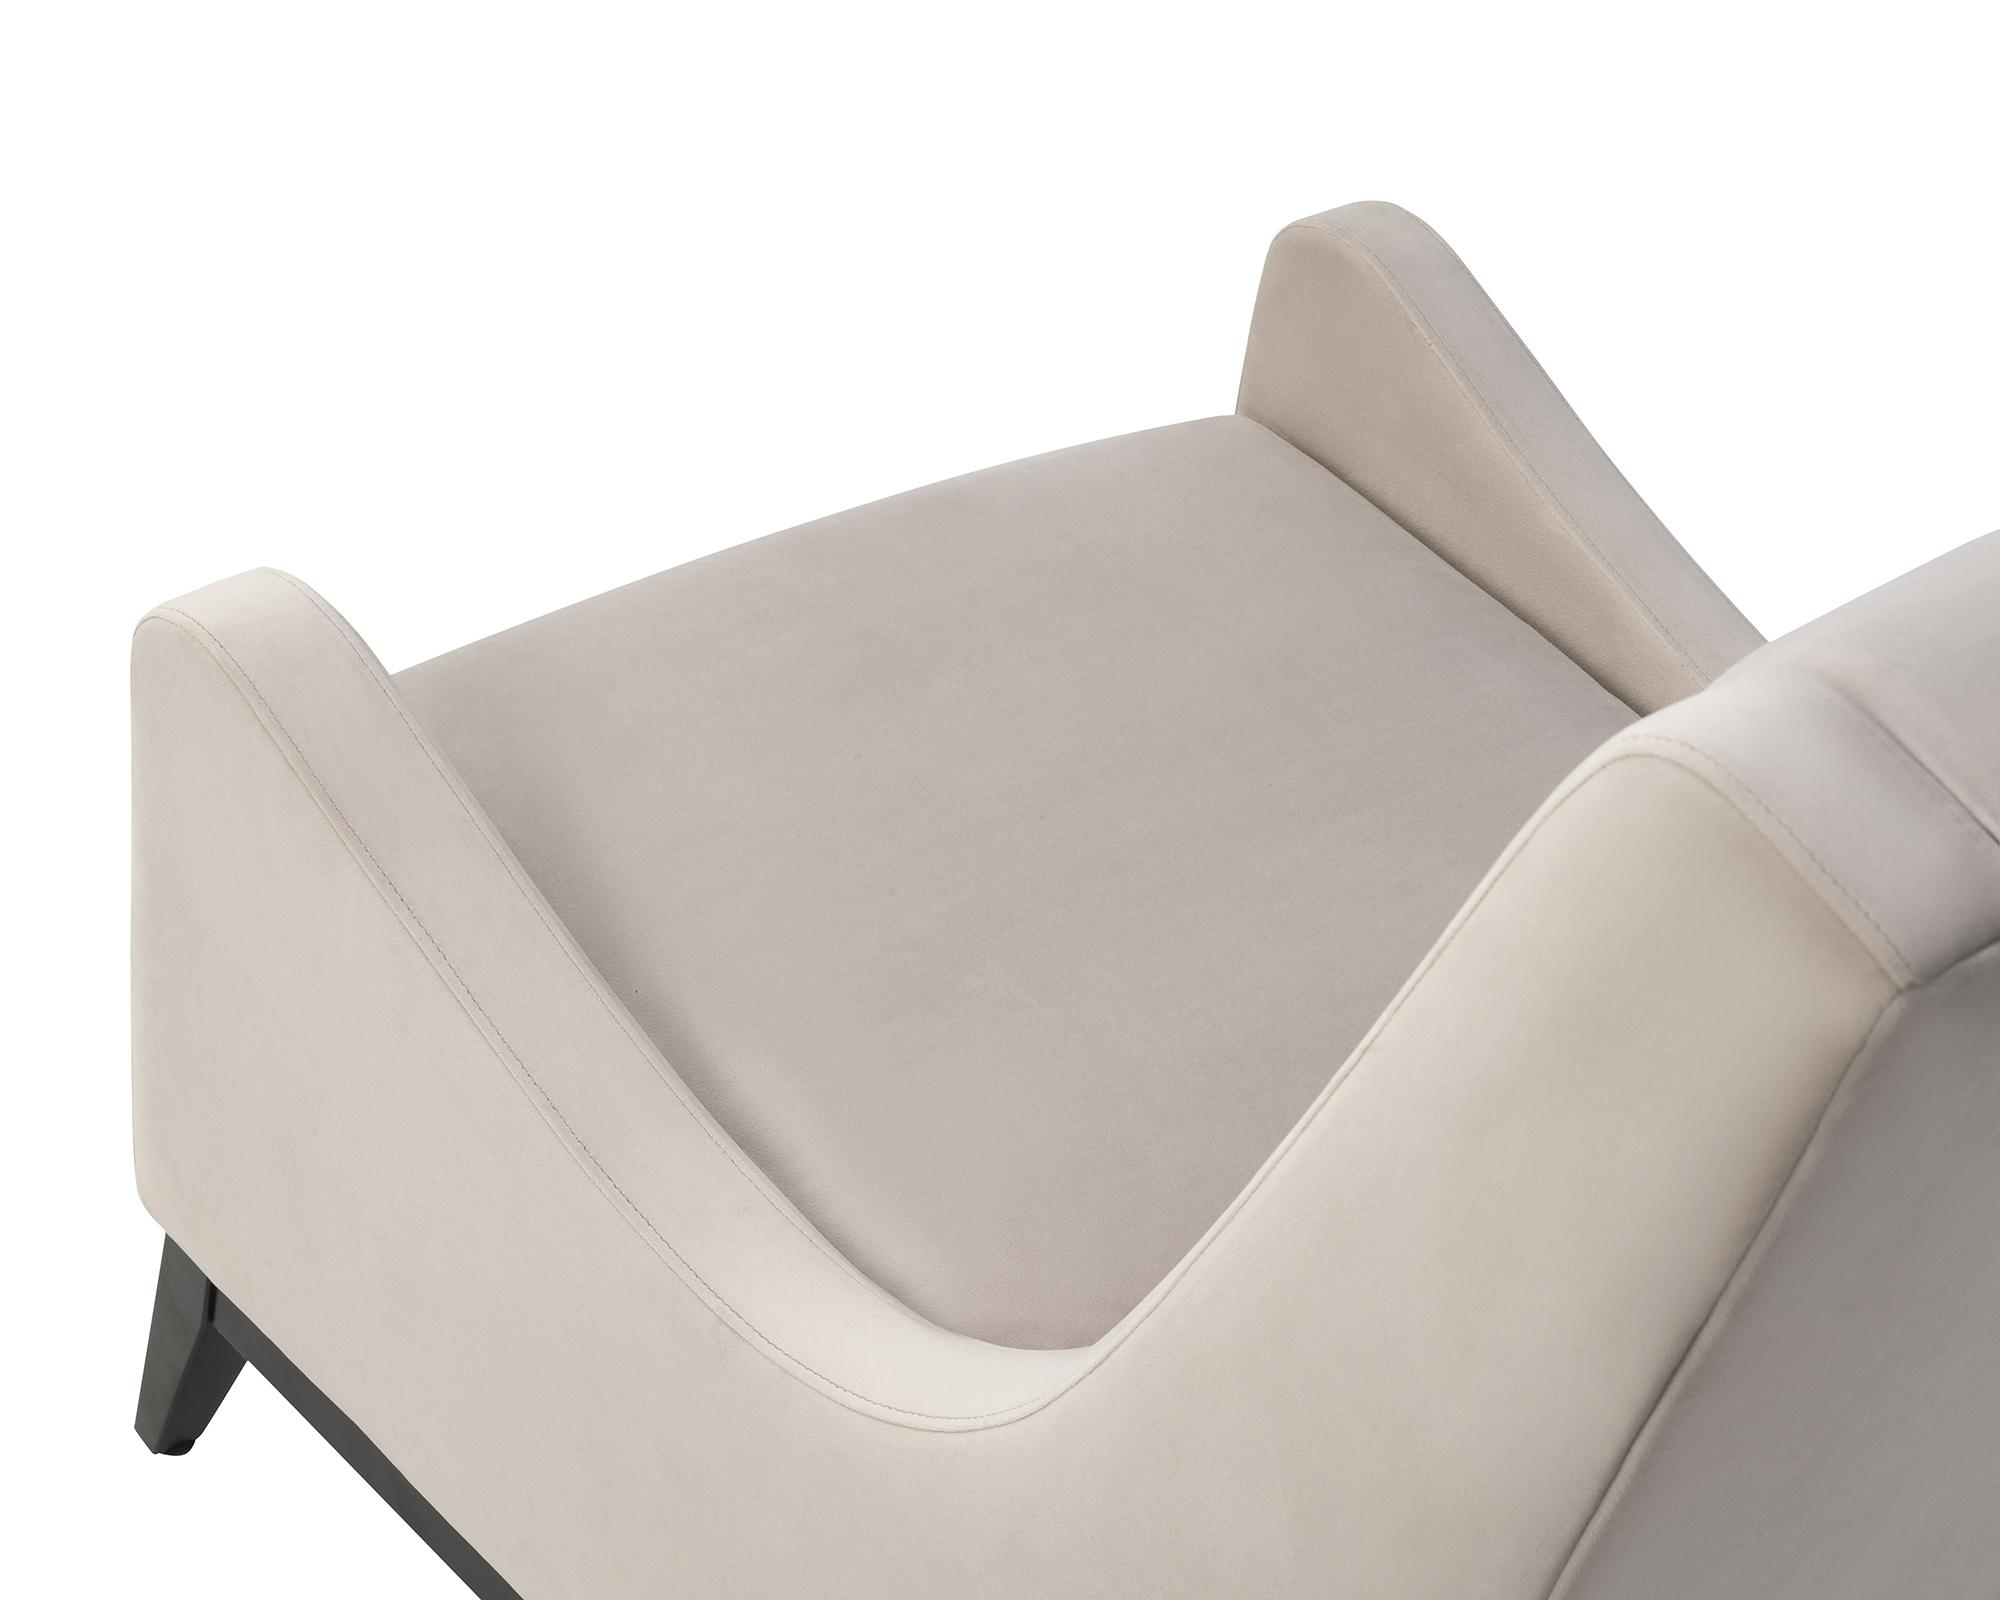 Liang & Eimil Lima Occasional Chair Limestone Velvet BH-OCH-089 (5)